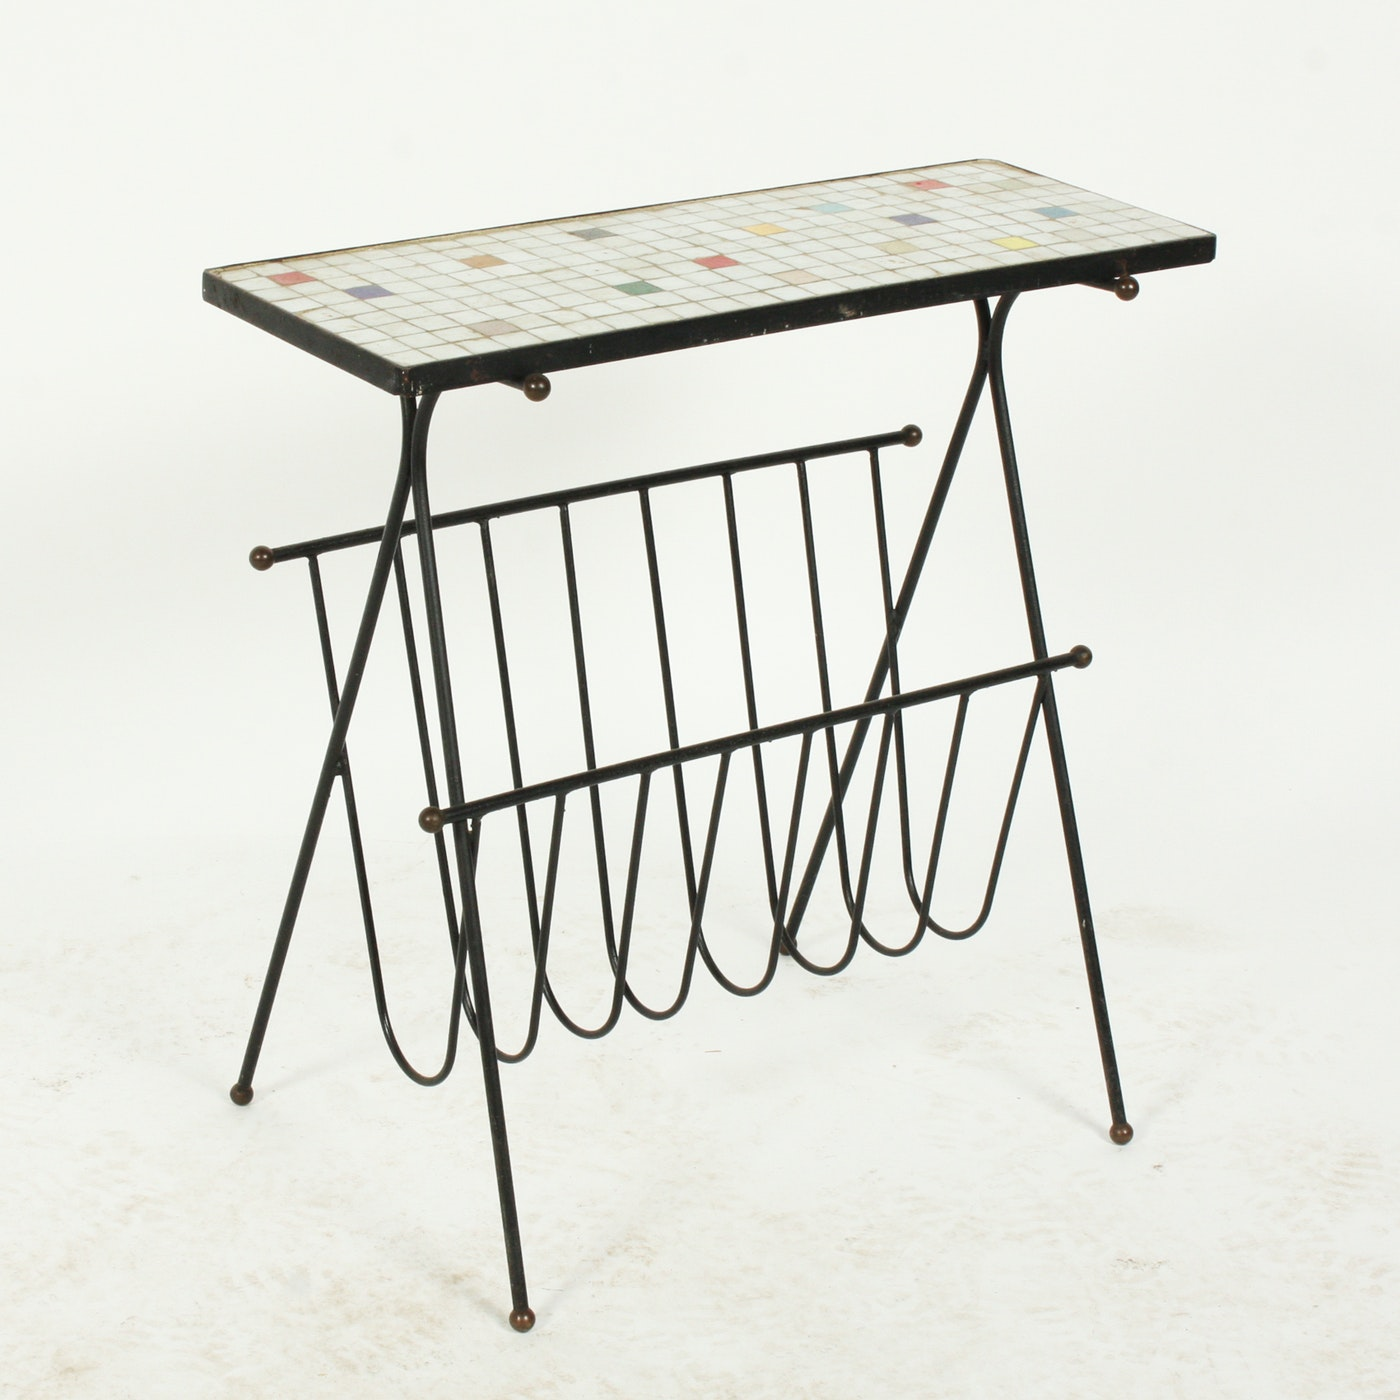 1950s Italian Mid Century Modern Brass And Mosaic Tile Top: Mid Century Modern Mosaic Tile Accent Table